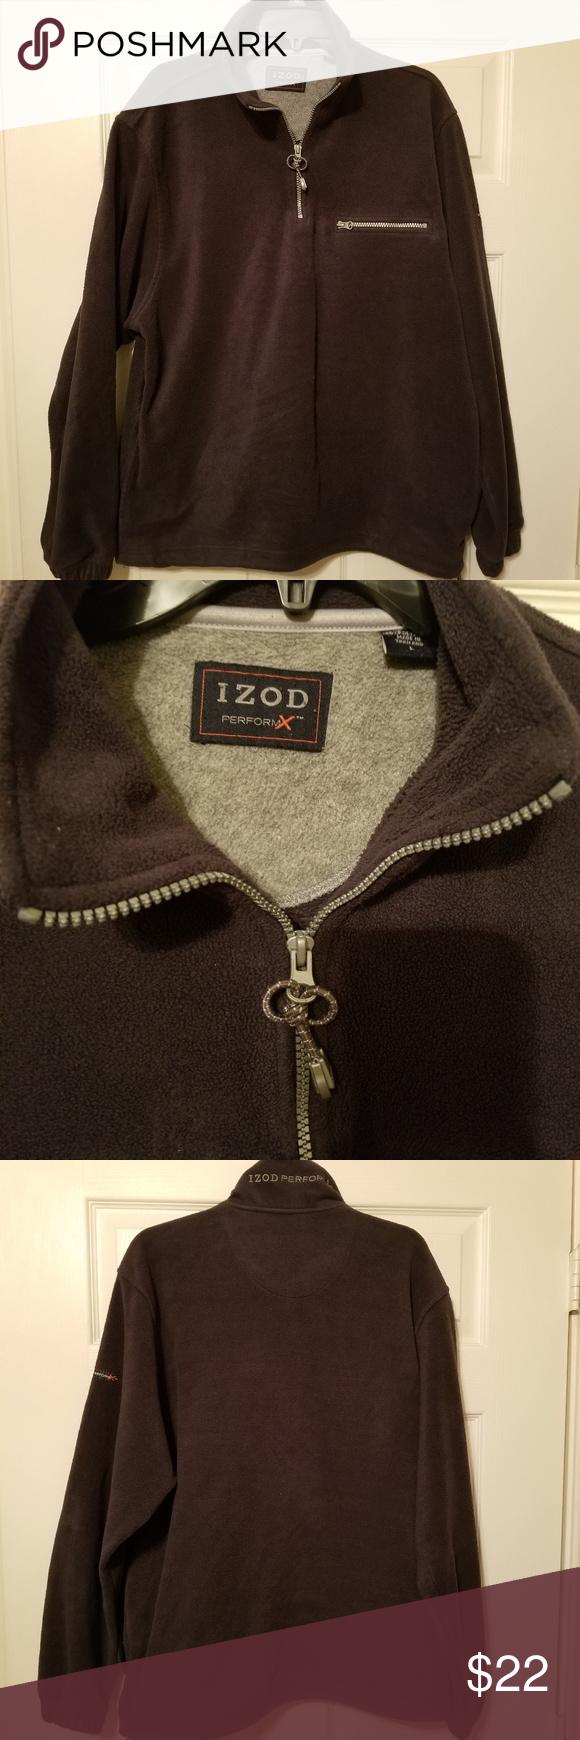 Izod Performx Fleece Pullover Size L Izod Performx Fleece Pullover Size L Izod Jackets Coats Performance Jackets Fleece Pullover Clothes Design Pullover [ 1740 x 580 Pixel ]